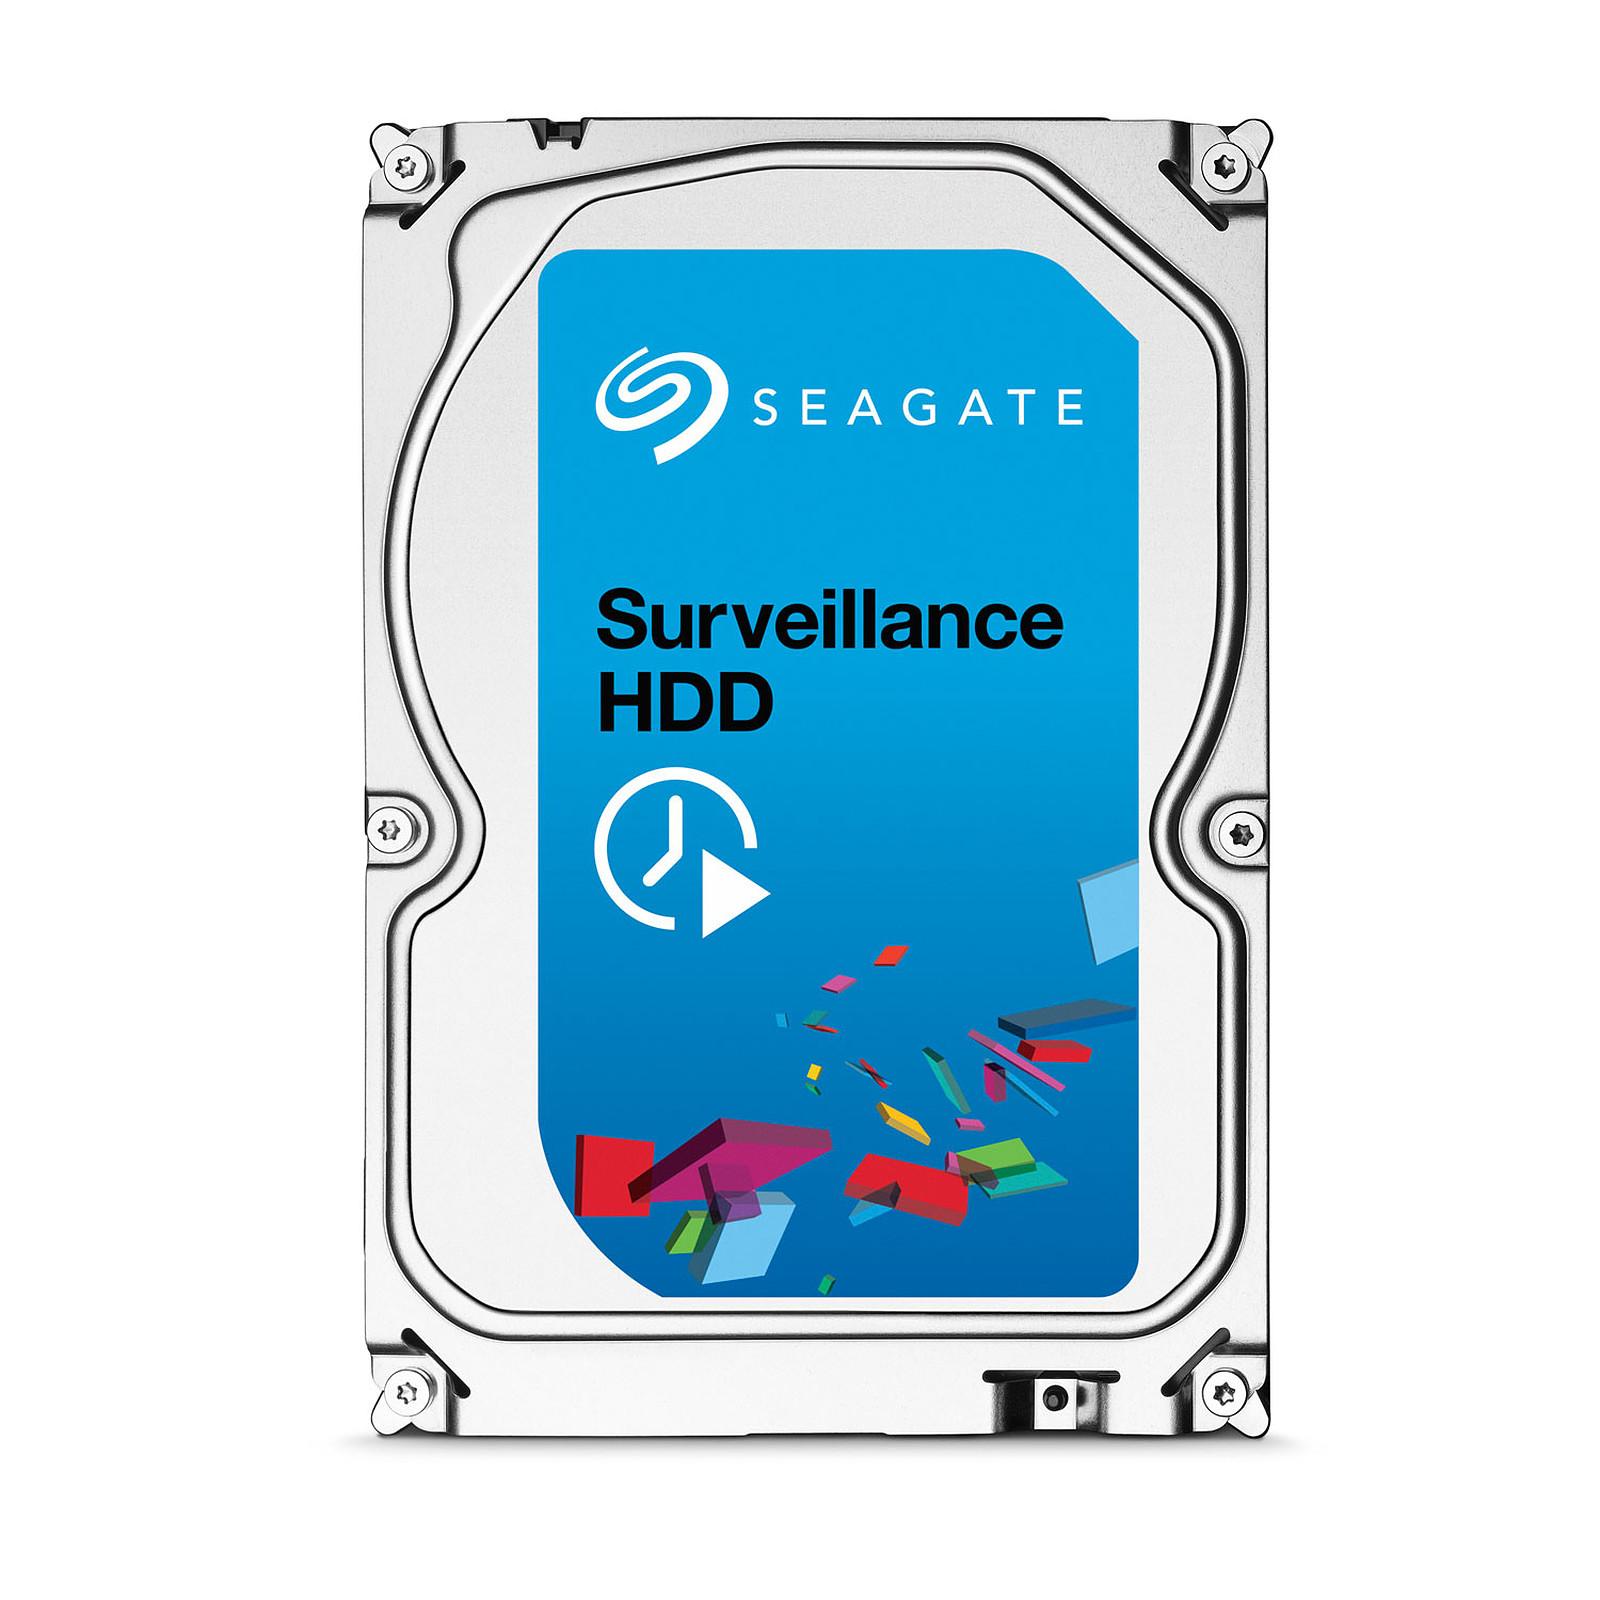 Seagate Surveillance HDD 5 To